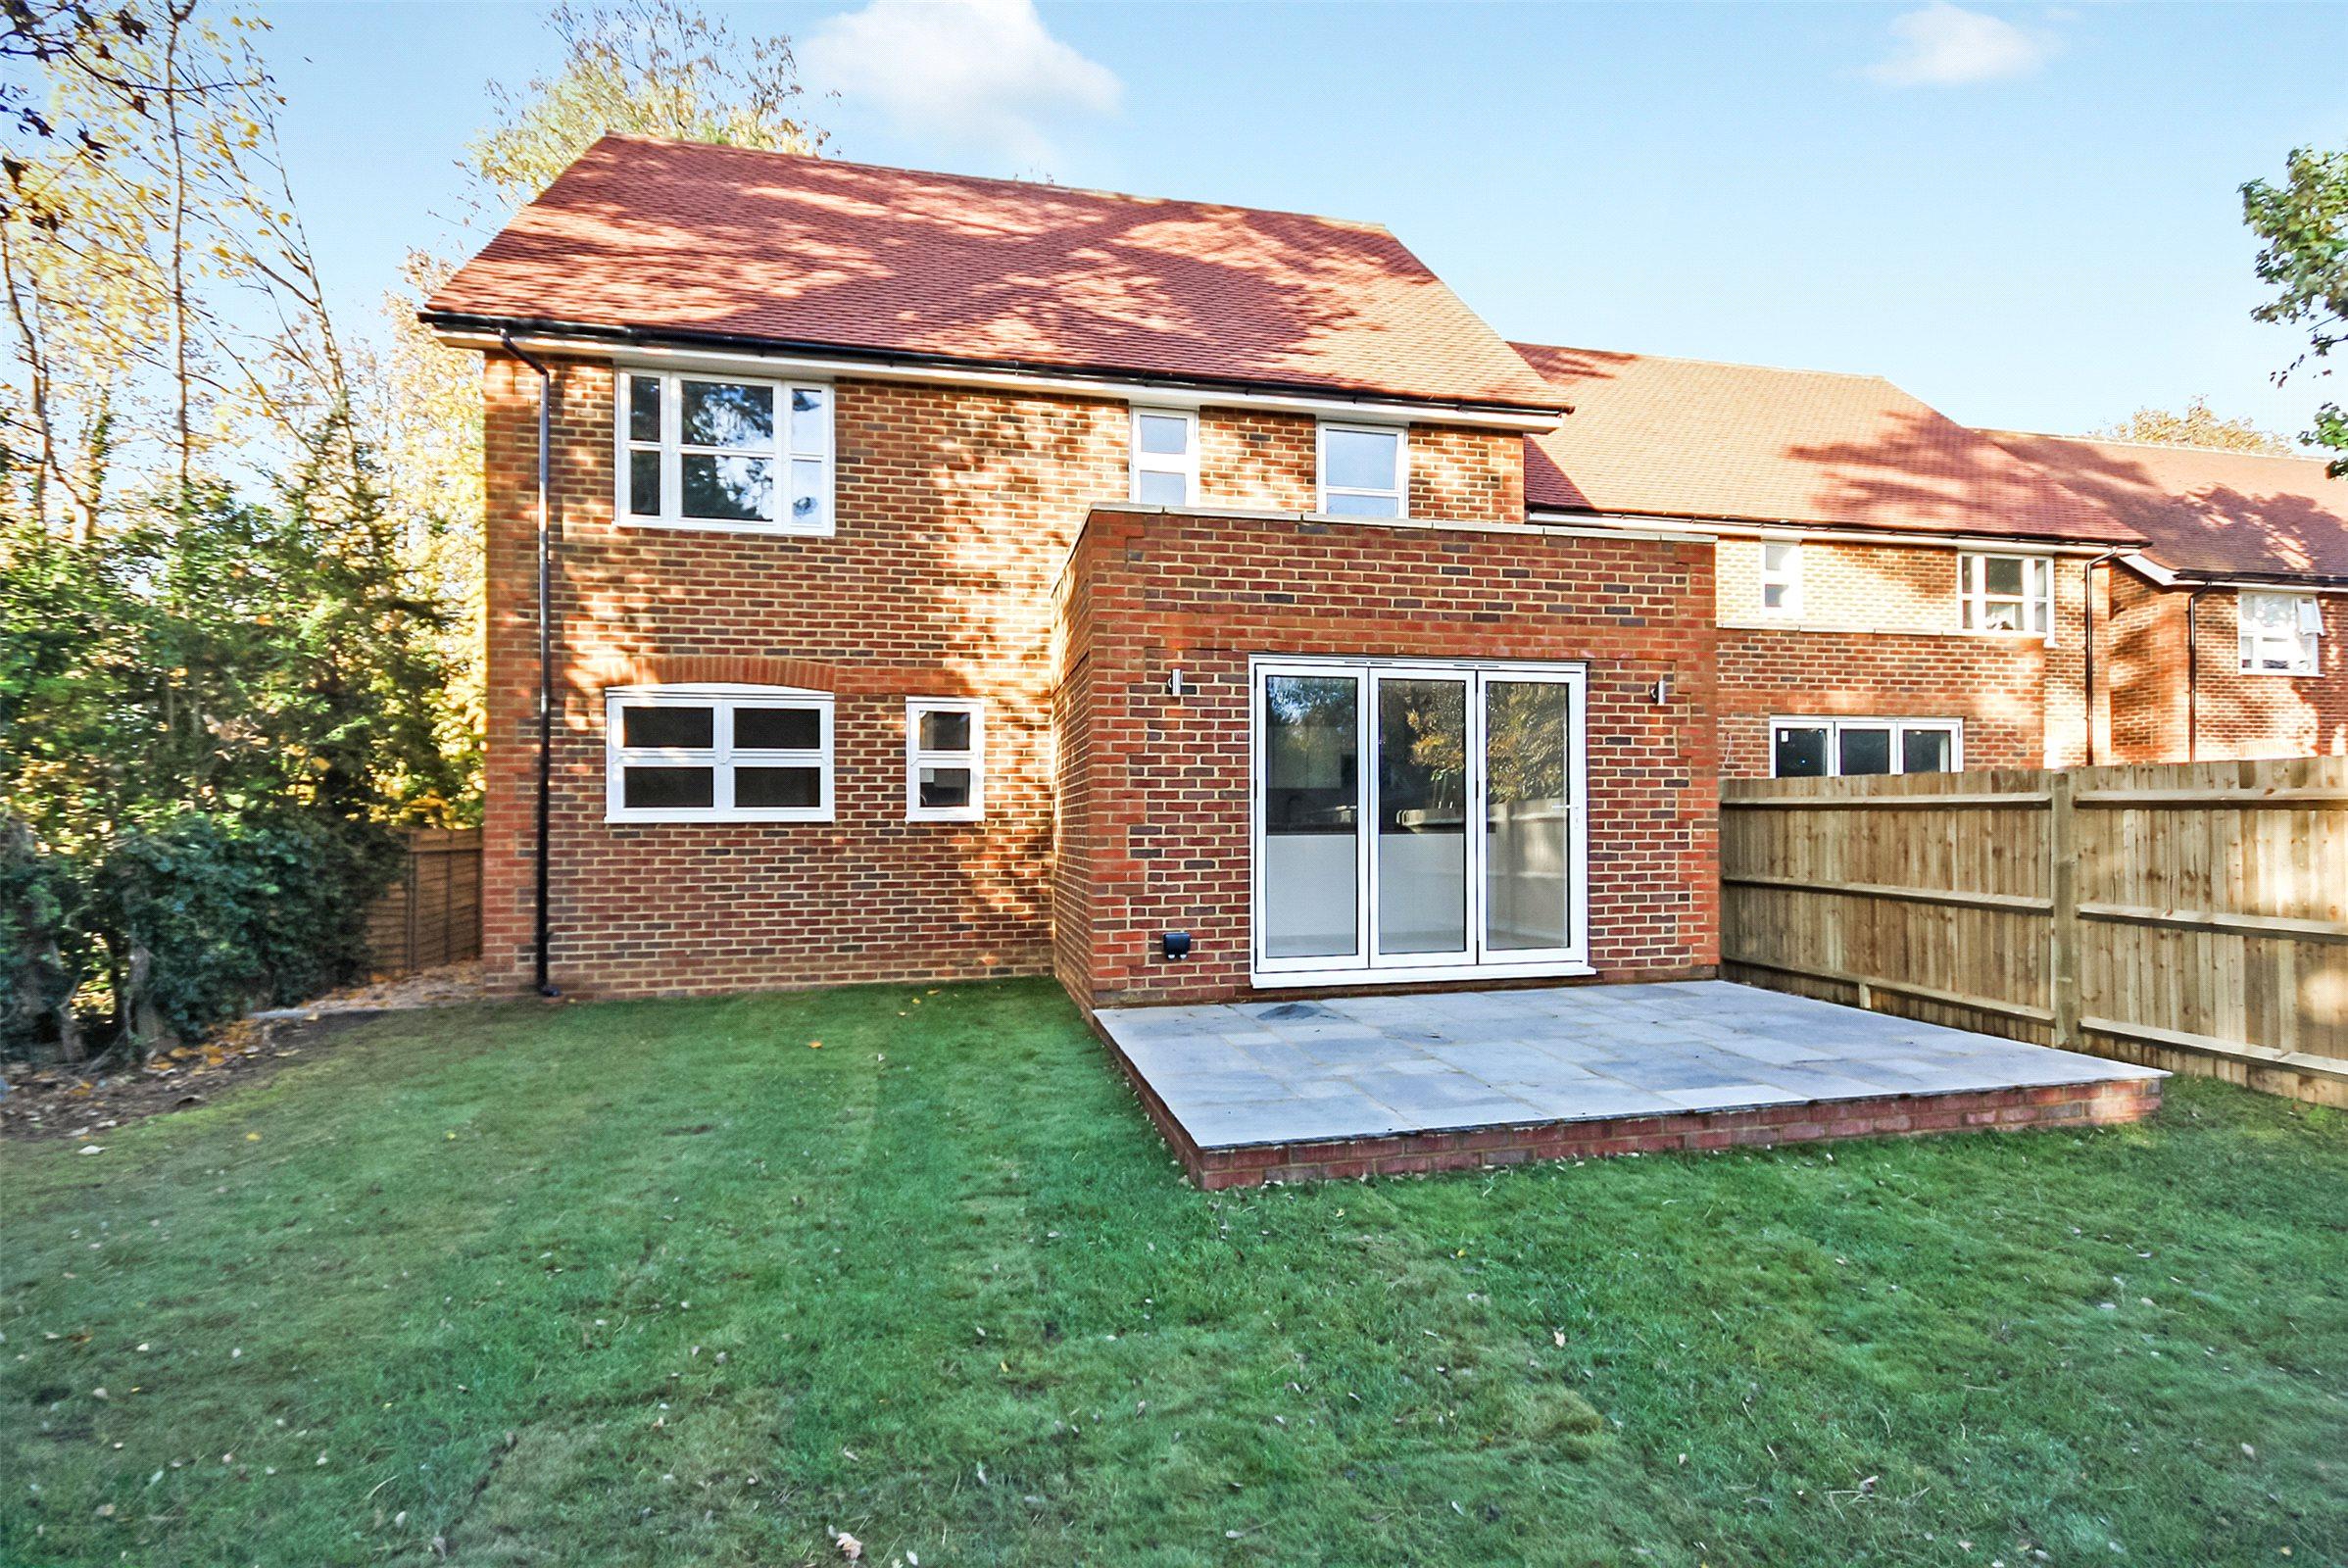 4 Bedrooms Detached House for sale in Pine Gardens, Horley, Surrey, RH6